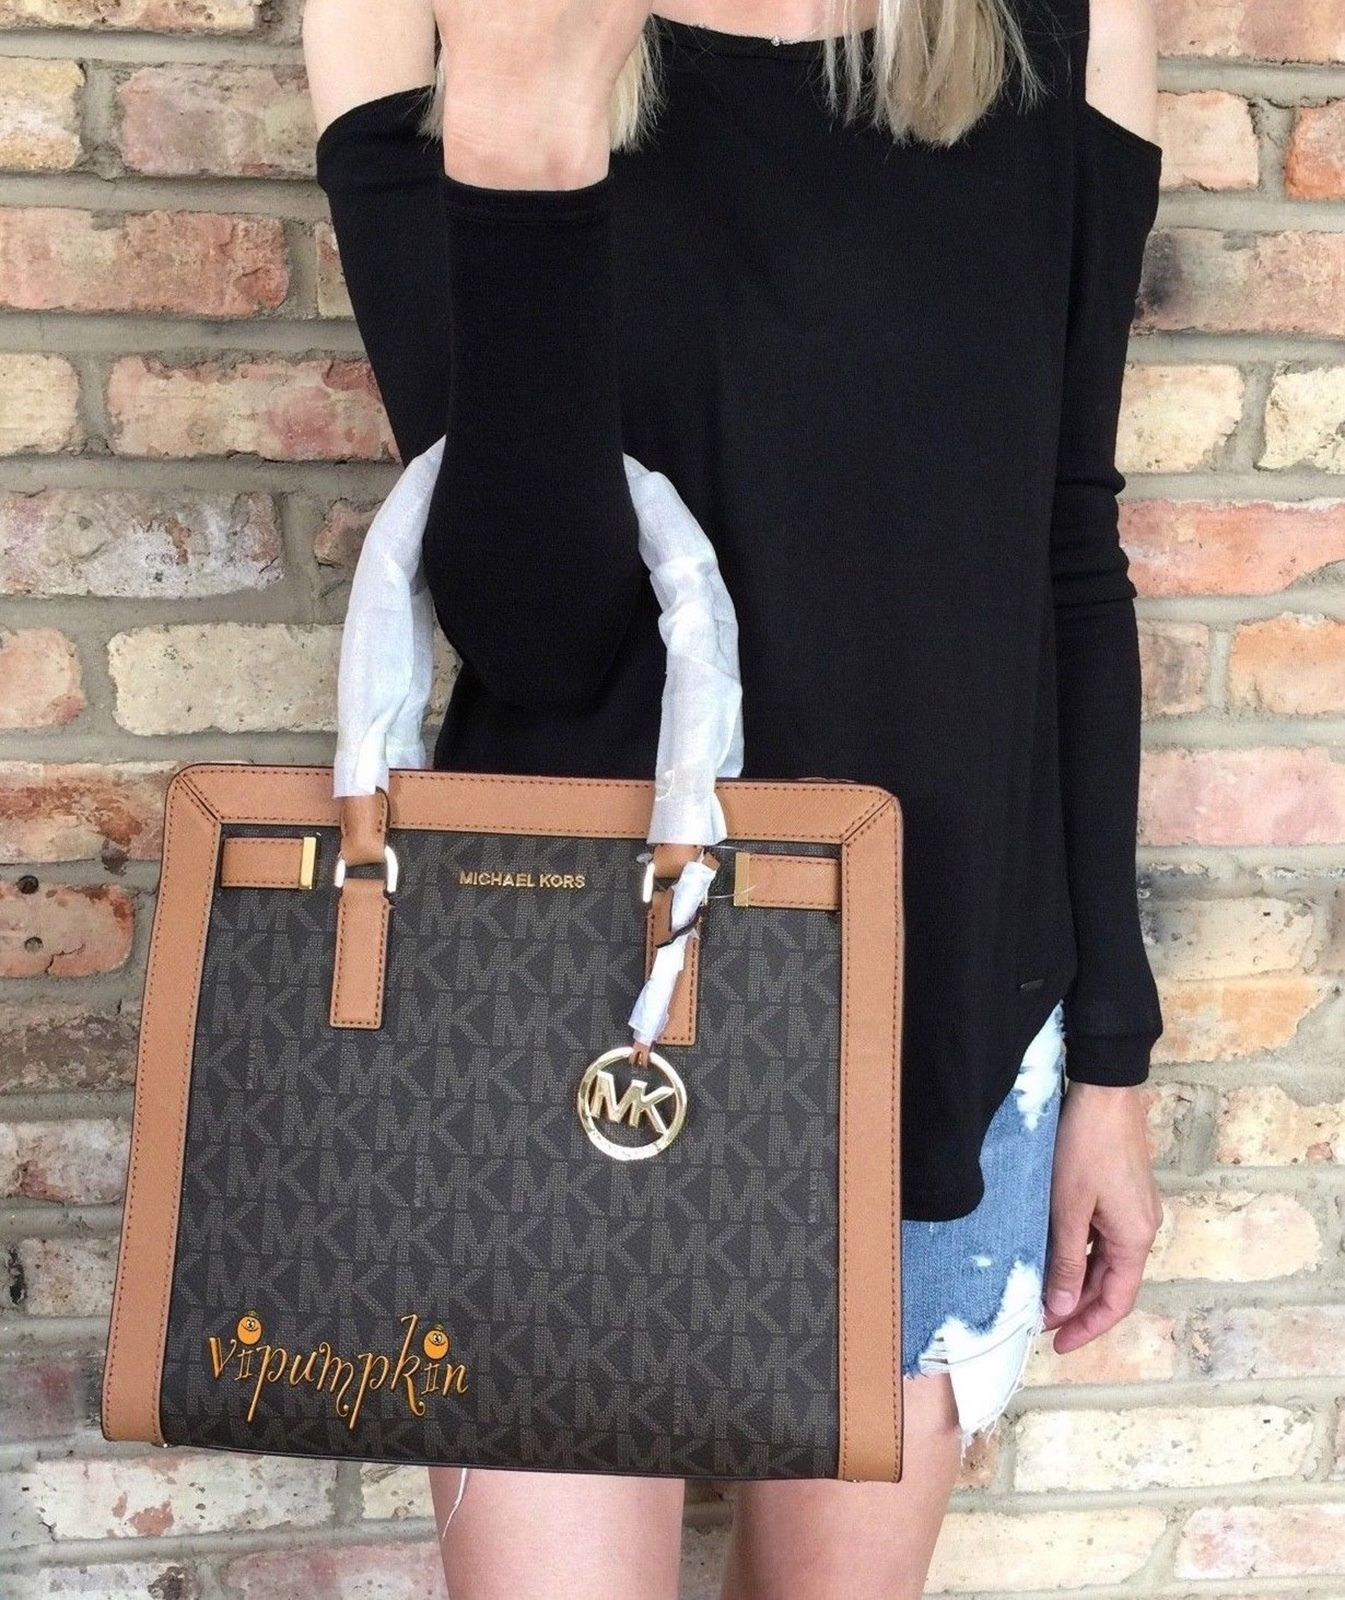 0a6bbaf0ecf501 MICHAEL KORS DILLON LARGE SATCHEL MK SIGNATURE PVC SAFFIANO LEATHER BAG  BROWN $196.29